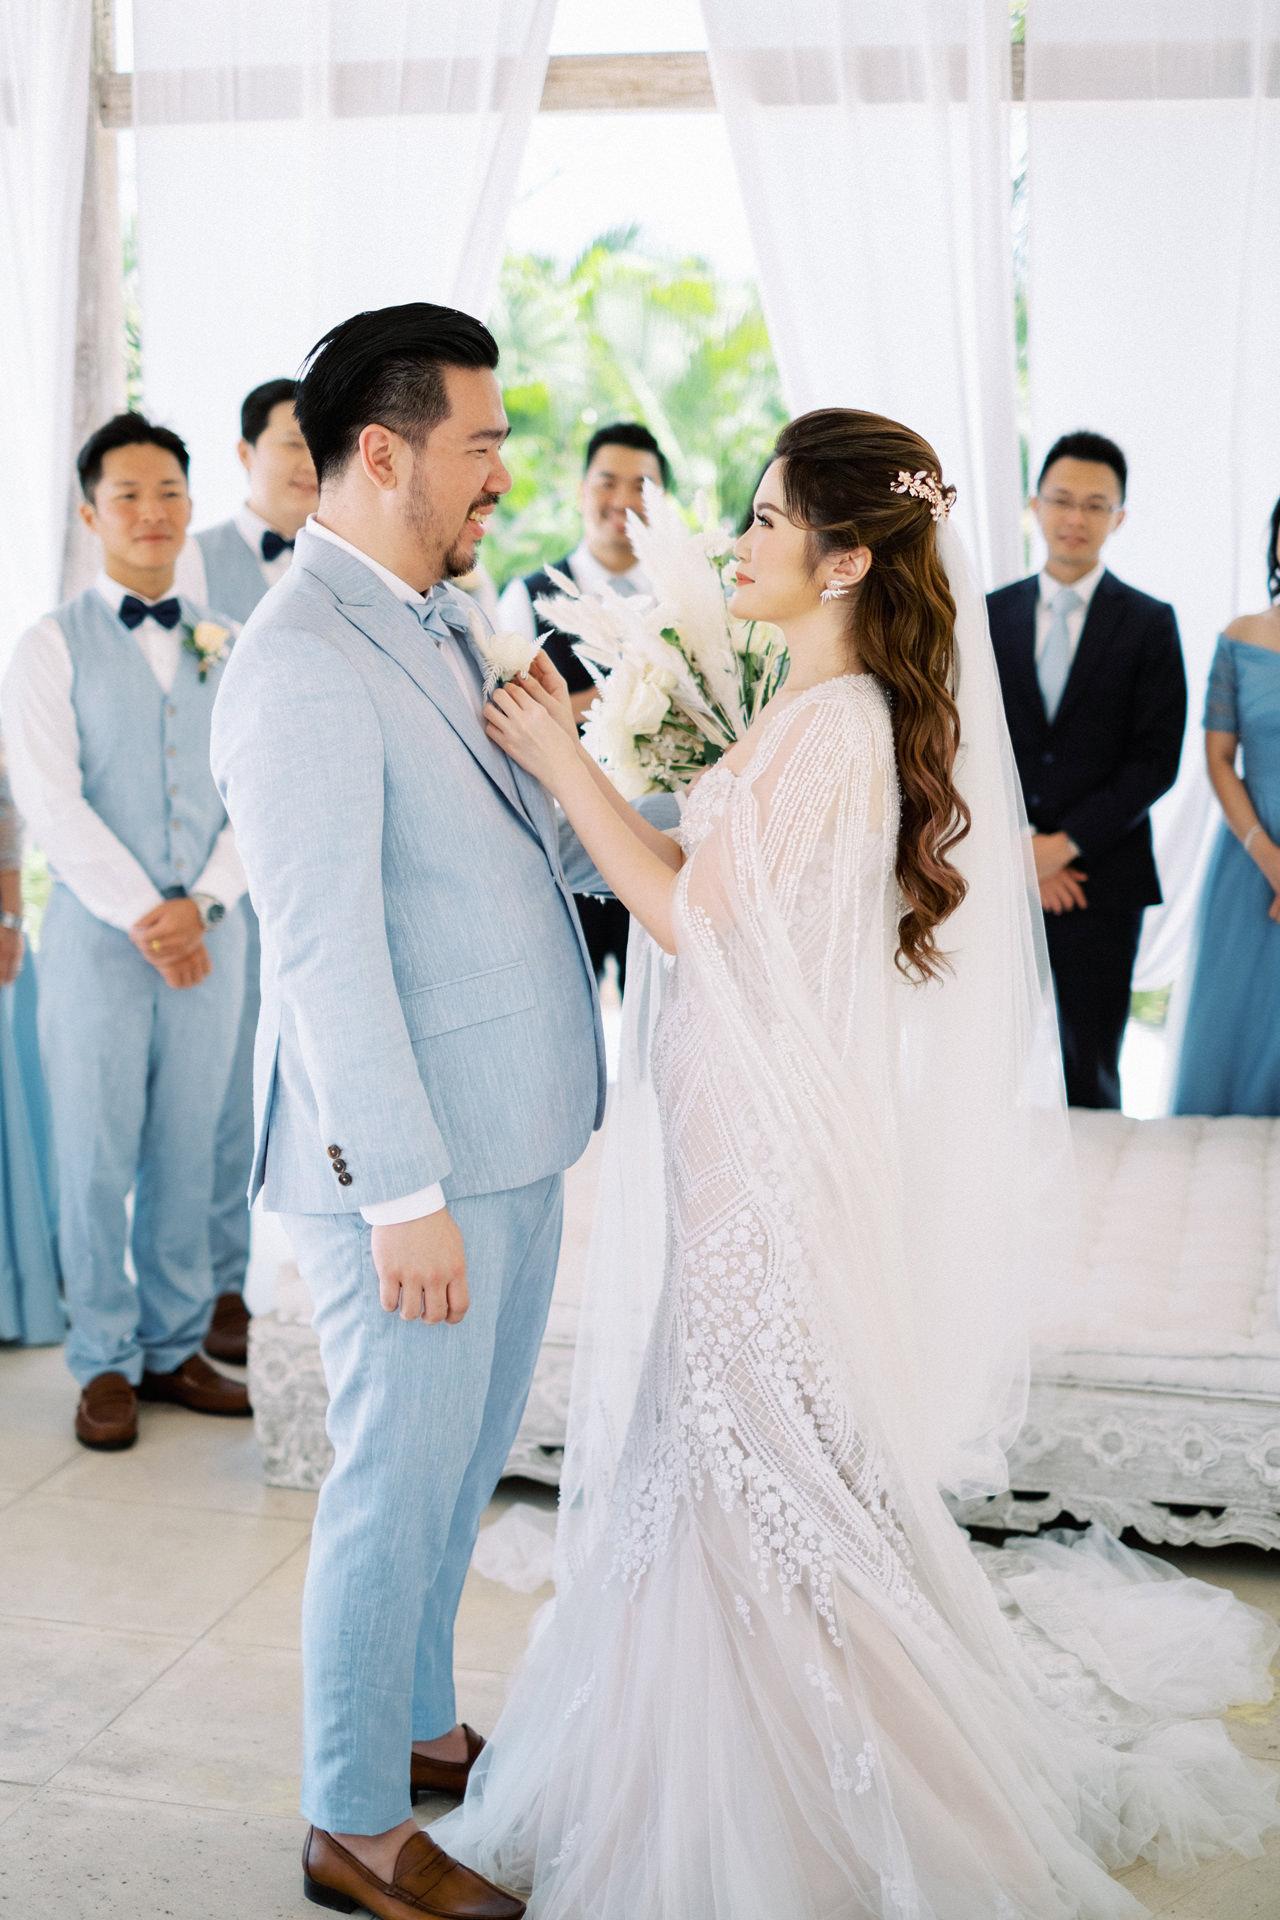 M&S: Shades of Blue Villa Plenilunio Bali Wedding 31